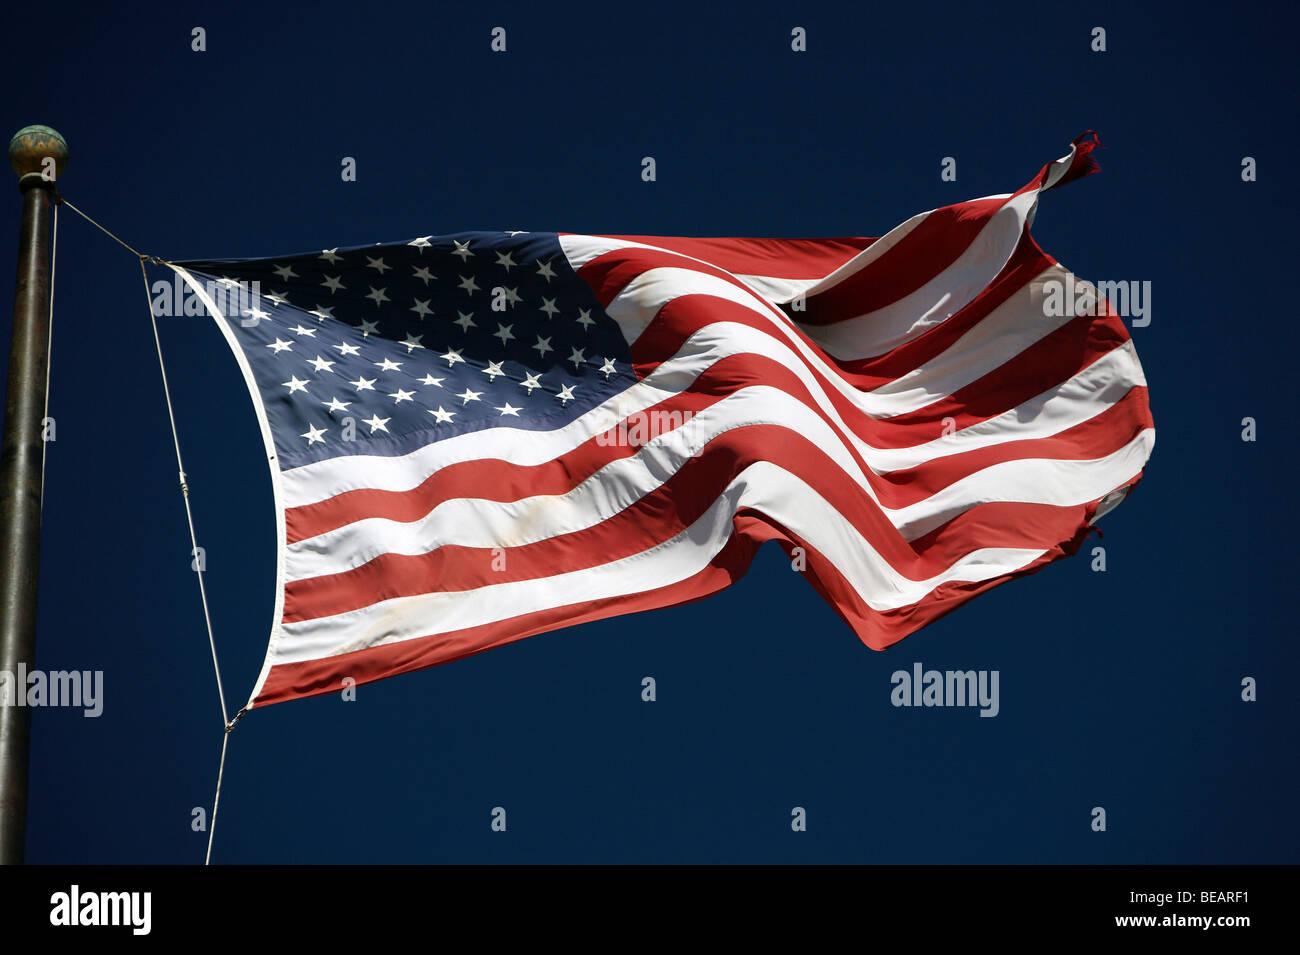 Fluttering American flag - Stock Image